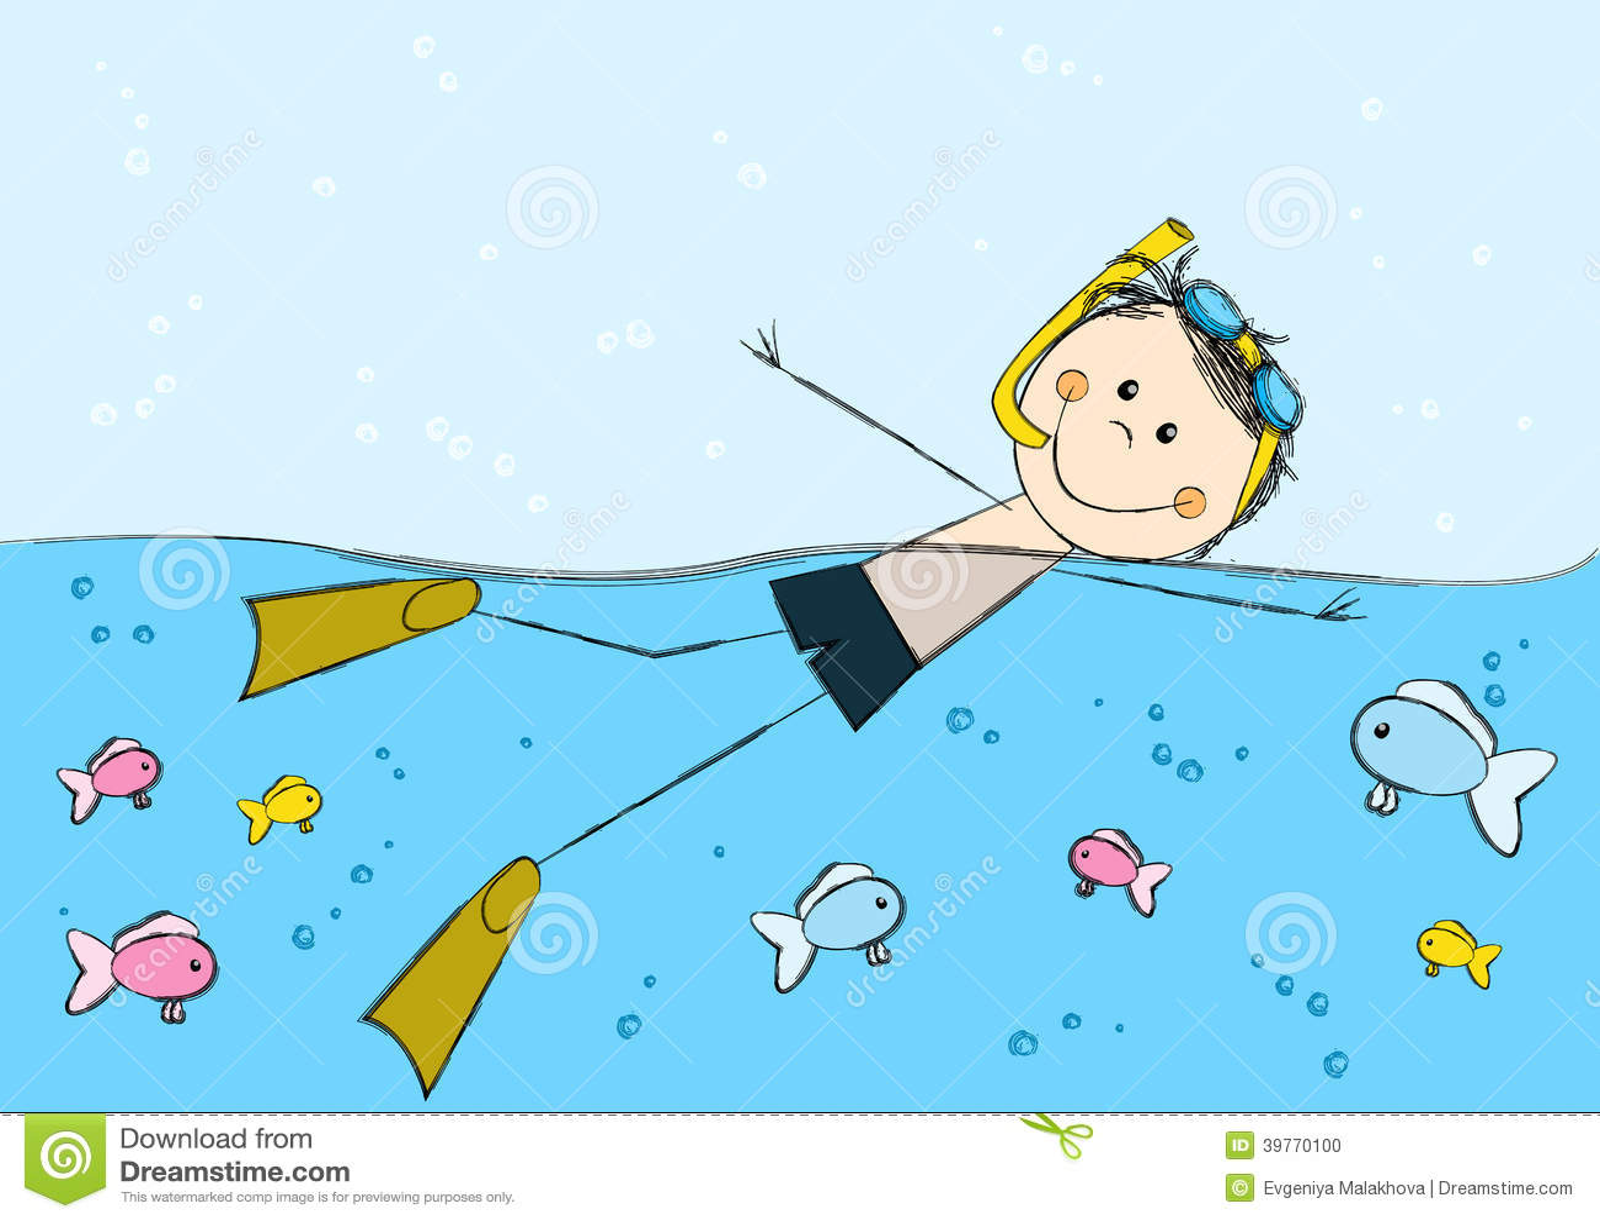 how to swim laps in the ocean